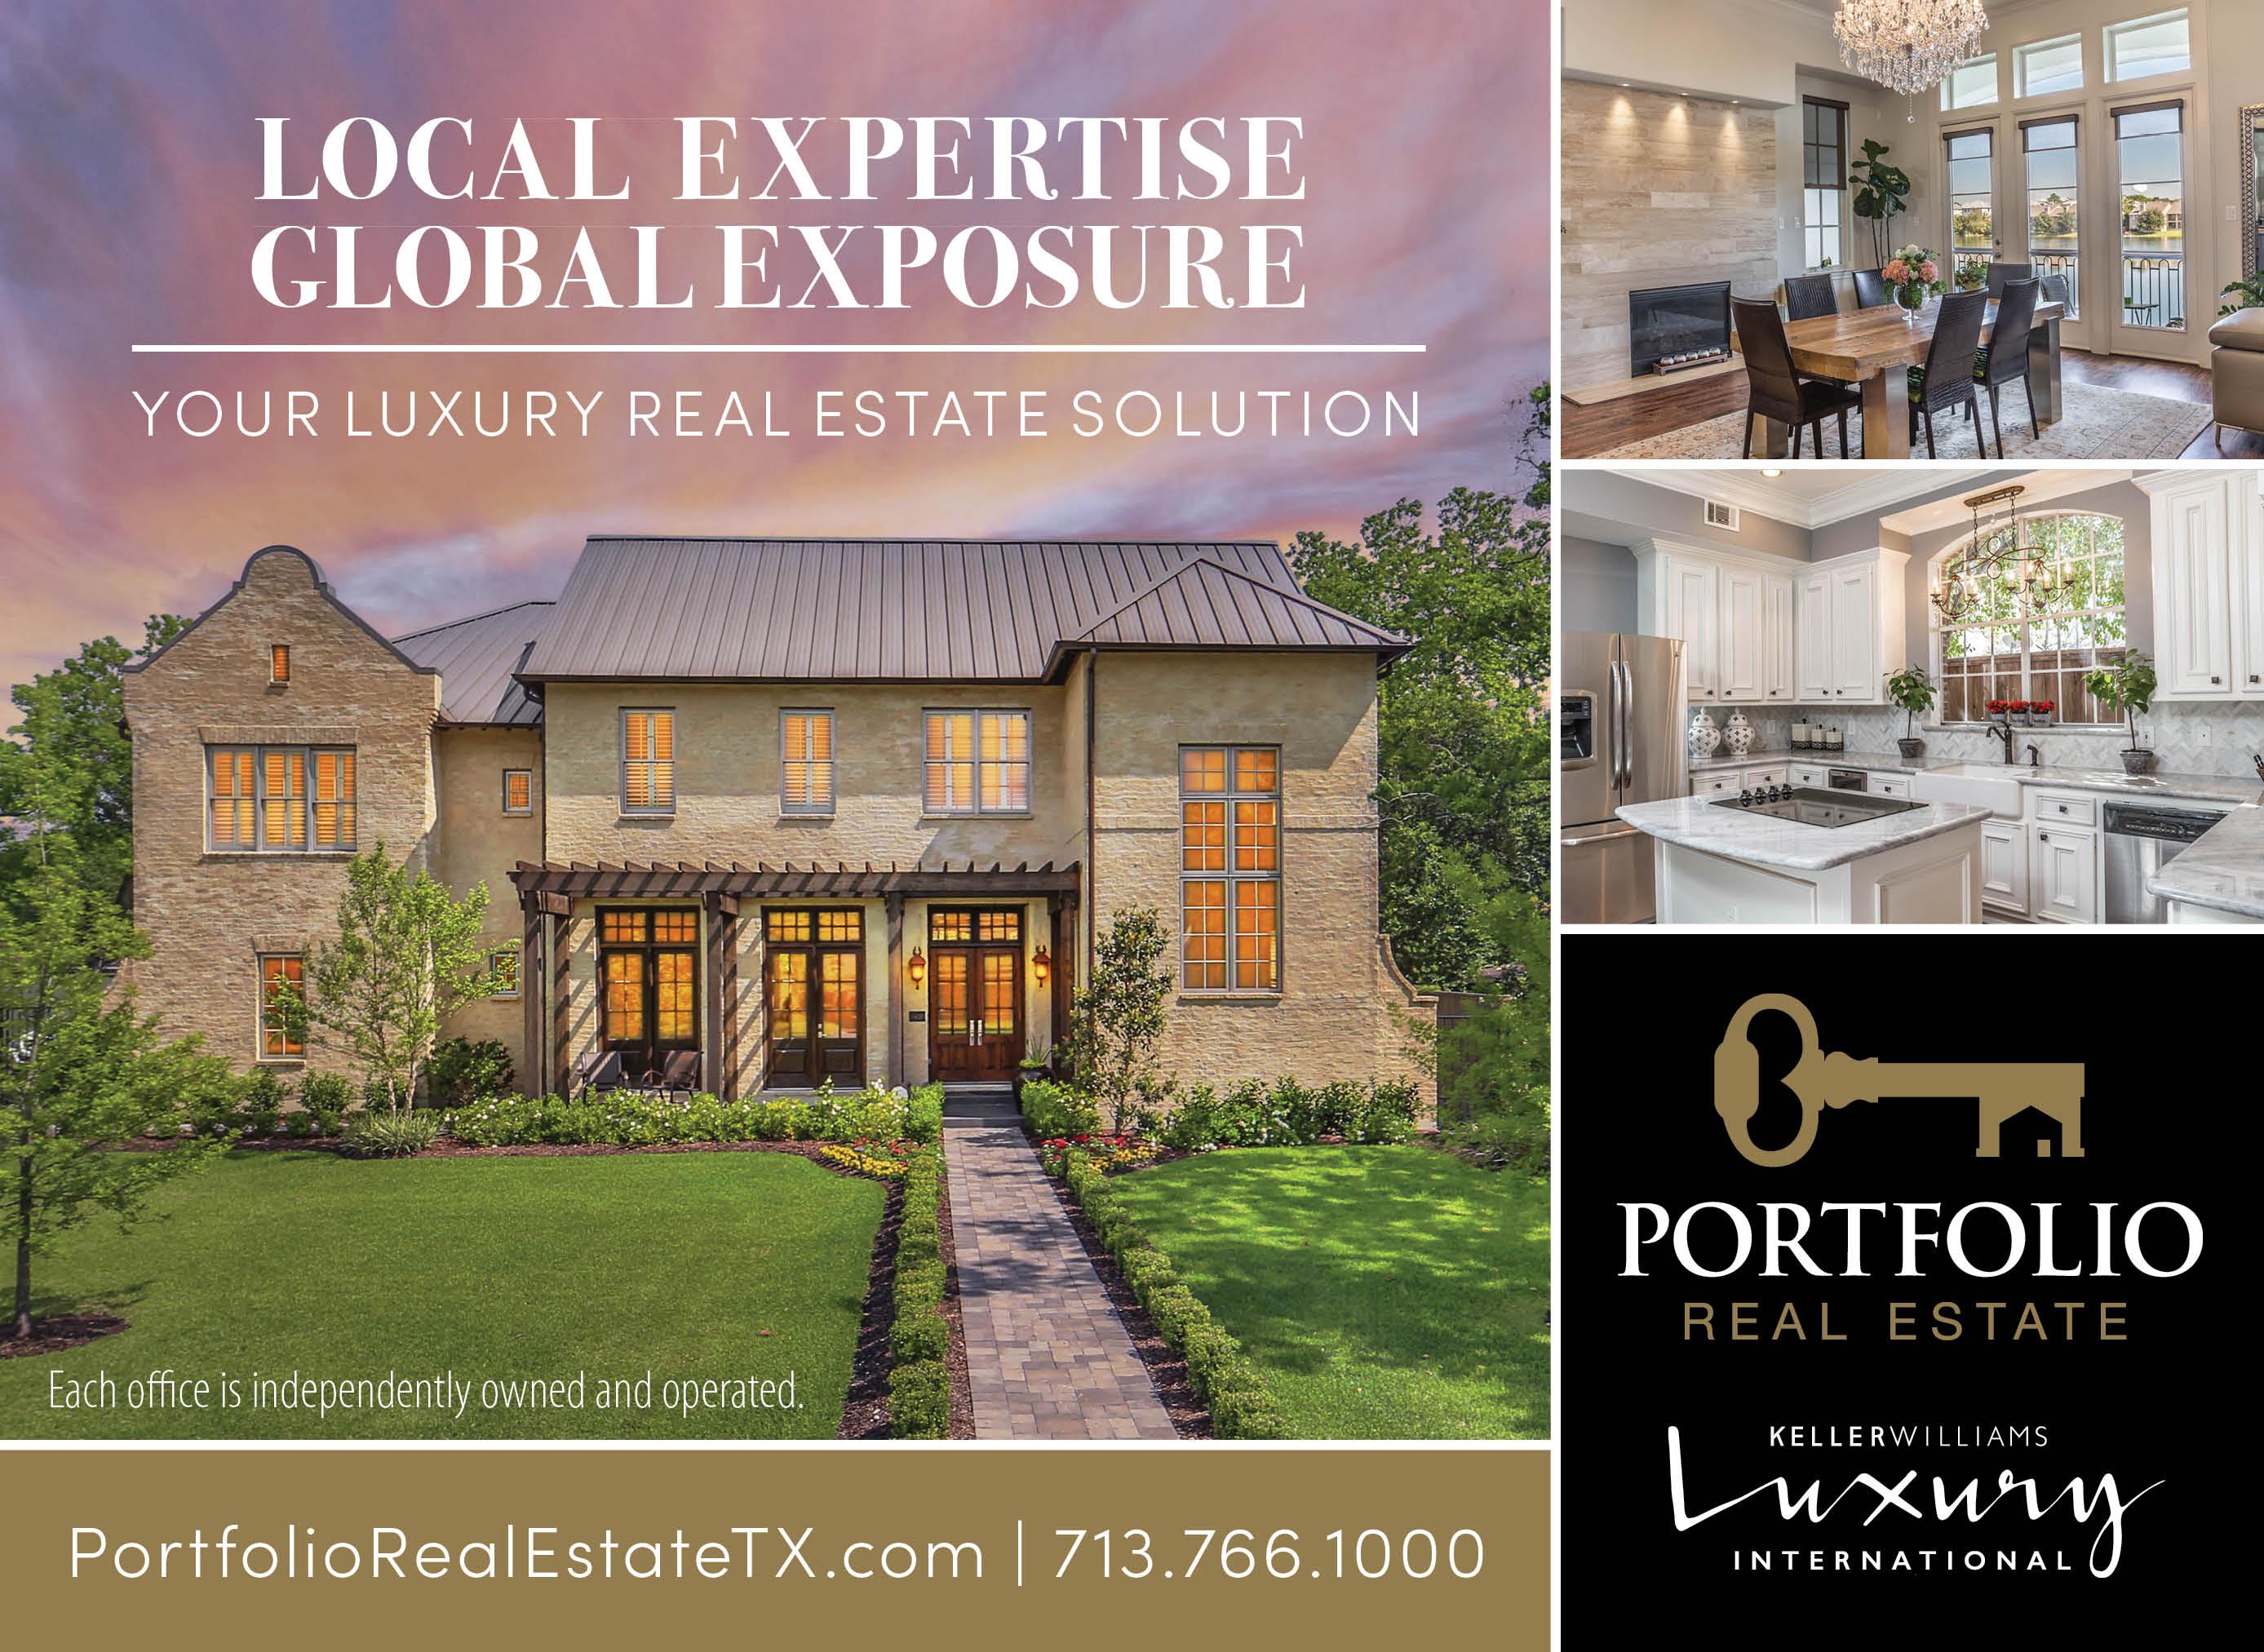 portfoliorealestatetx.com 713-766-1000